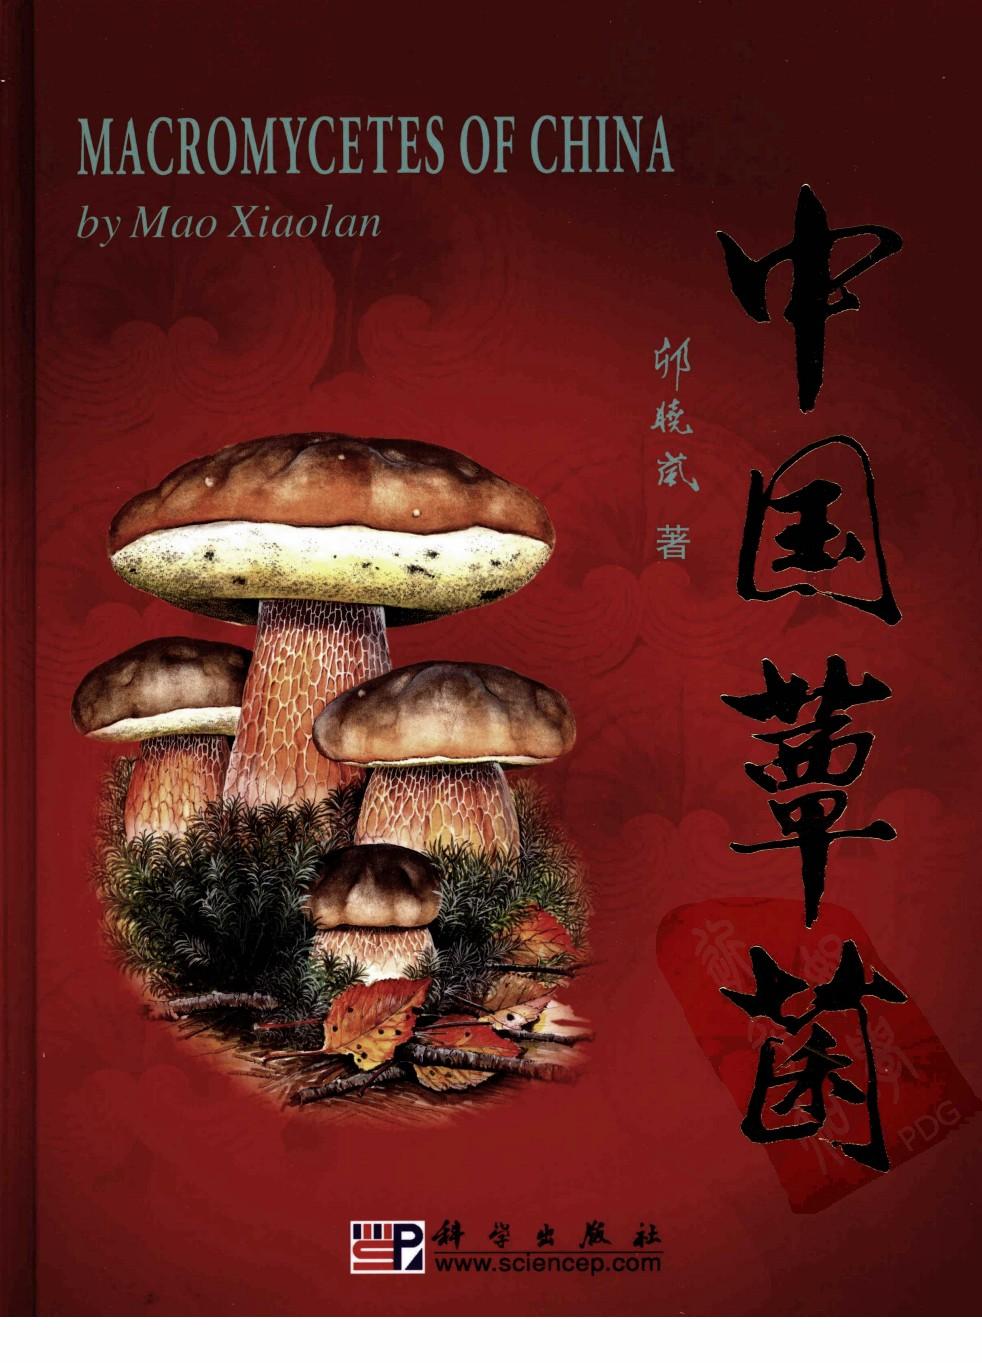 MACROMYCETES OF CHINA 中国蕈菌